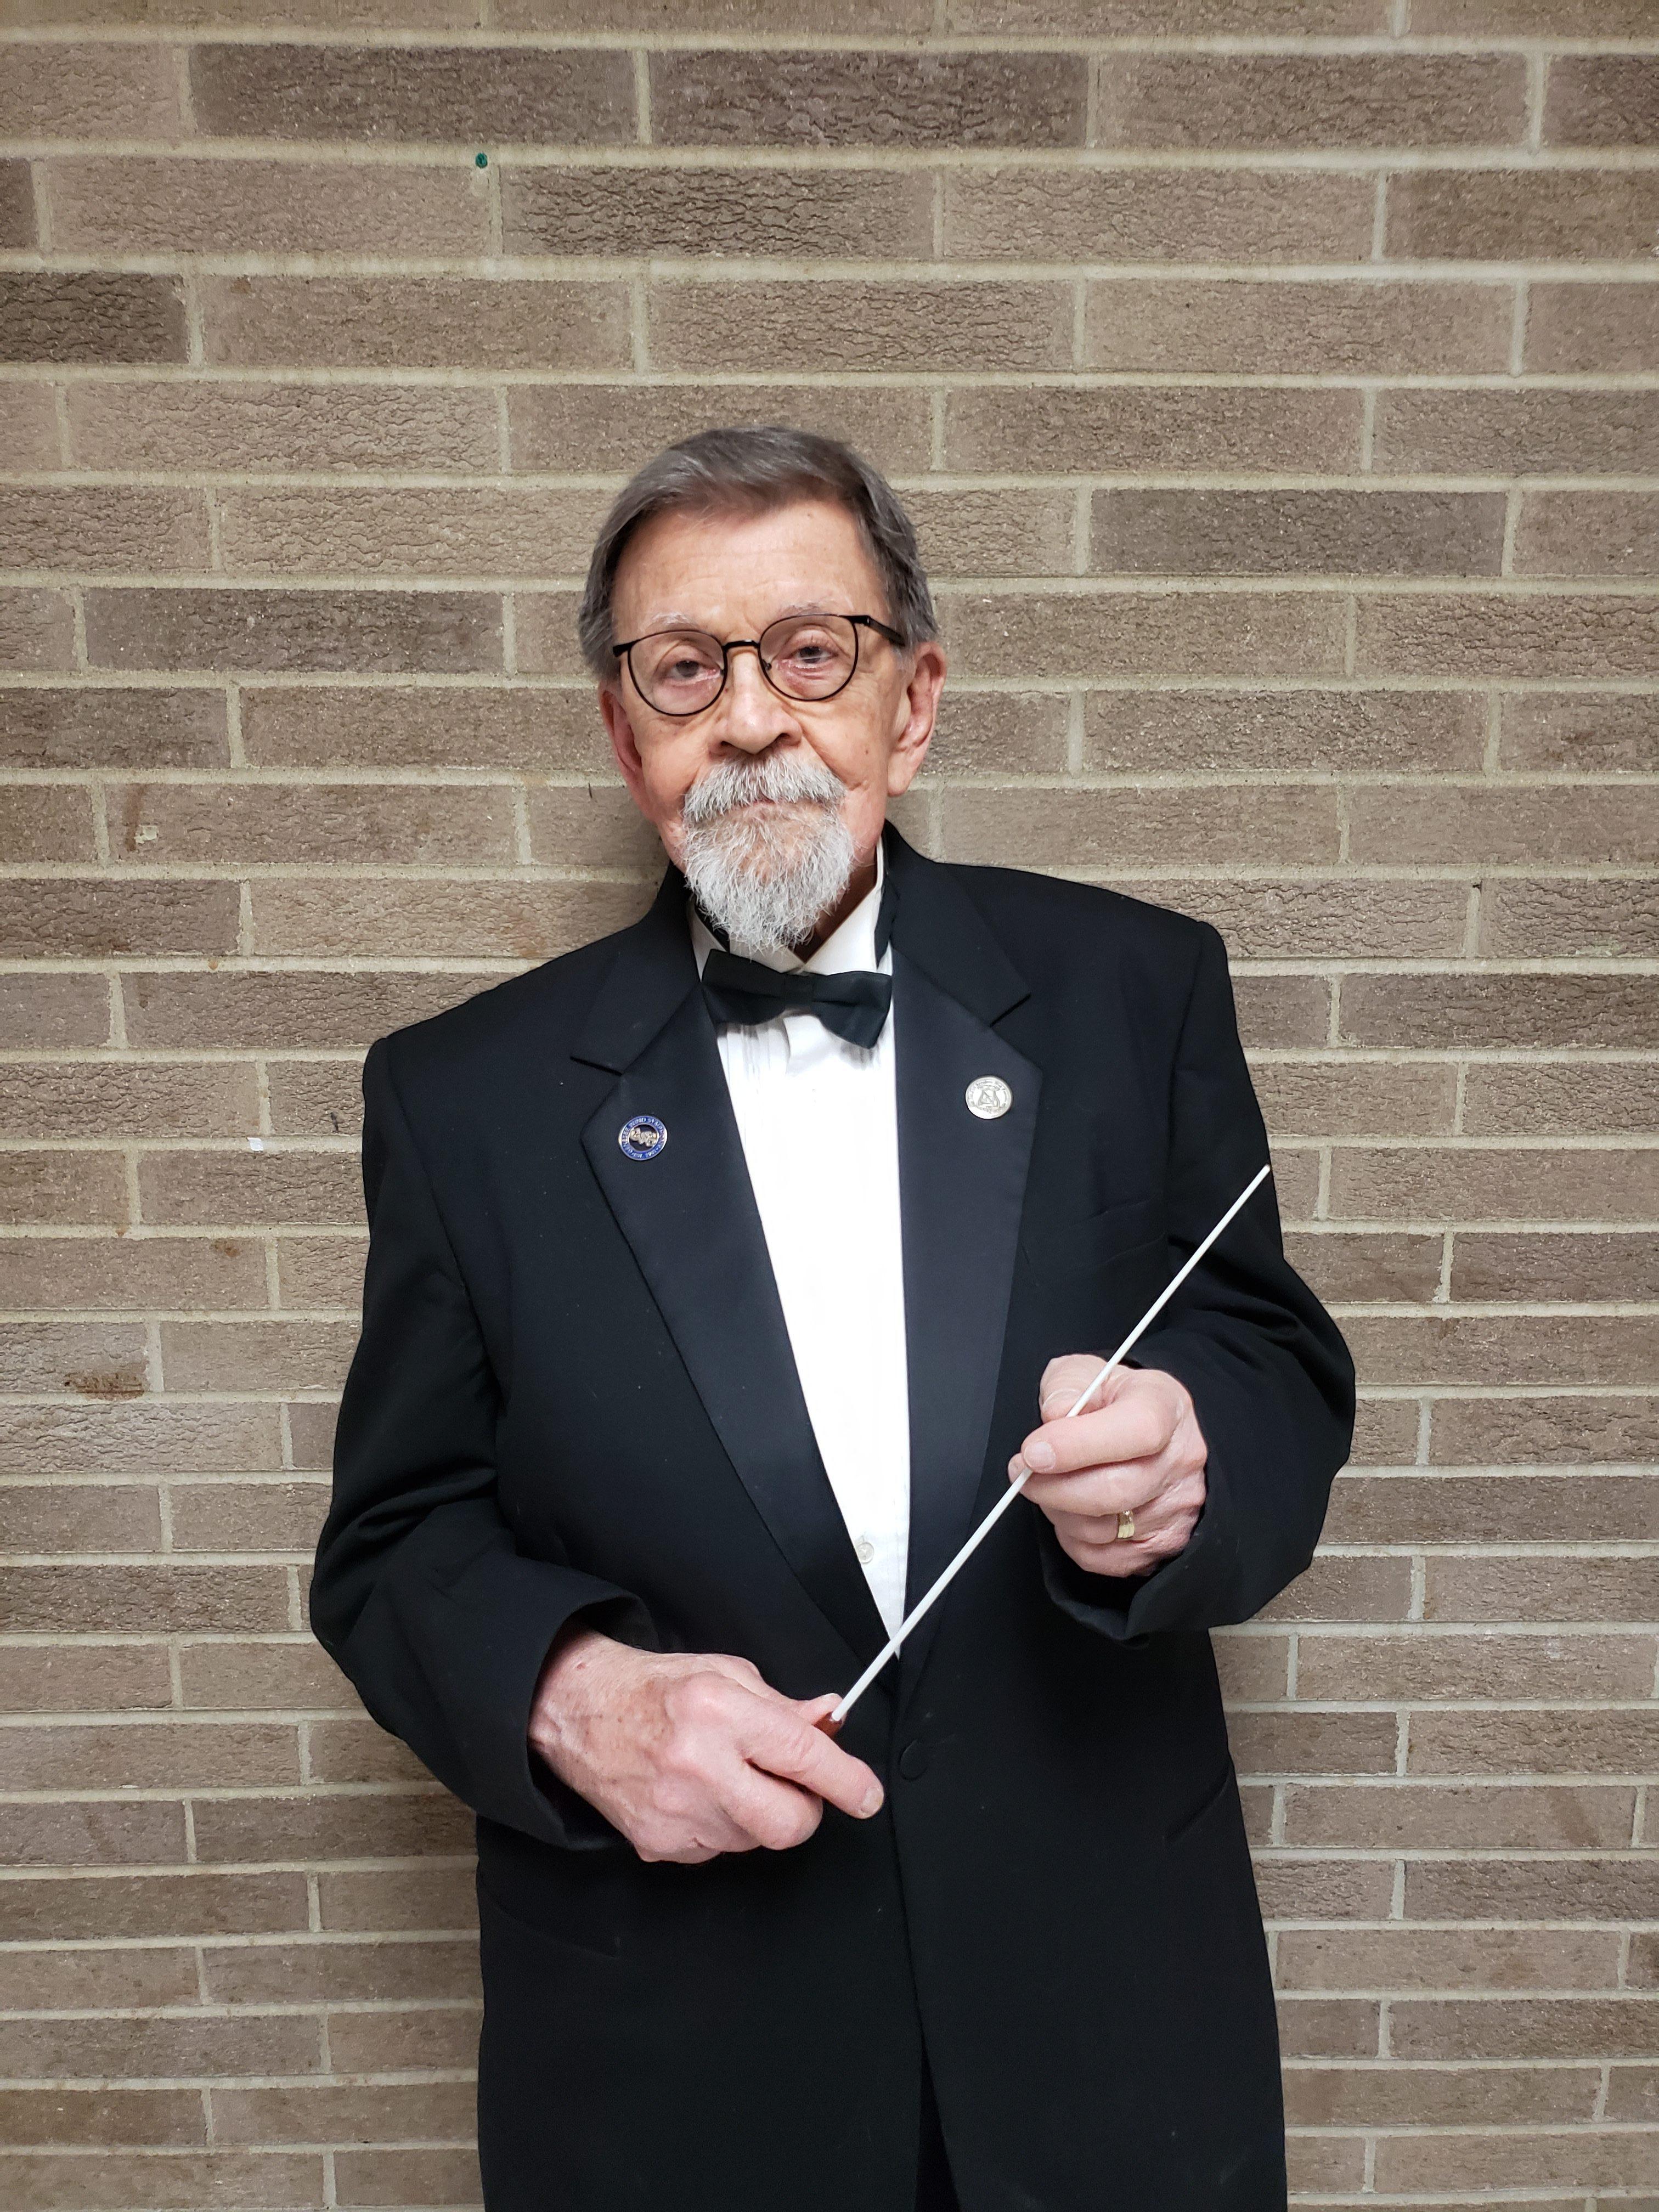 Don Clough, conductor emeritus of the FSWE